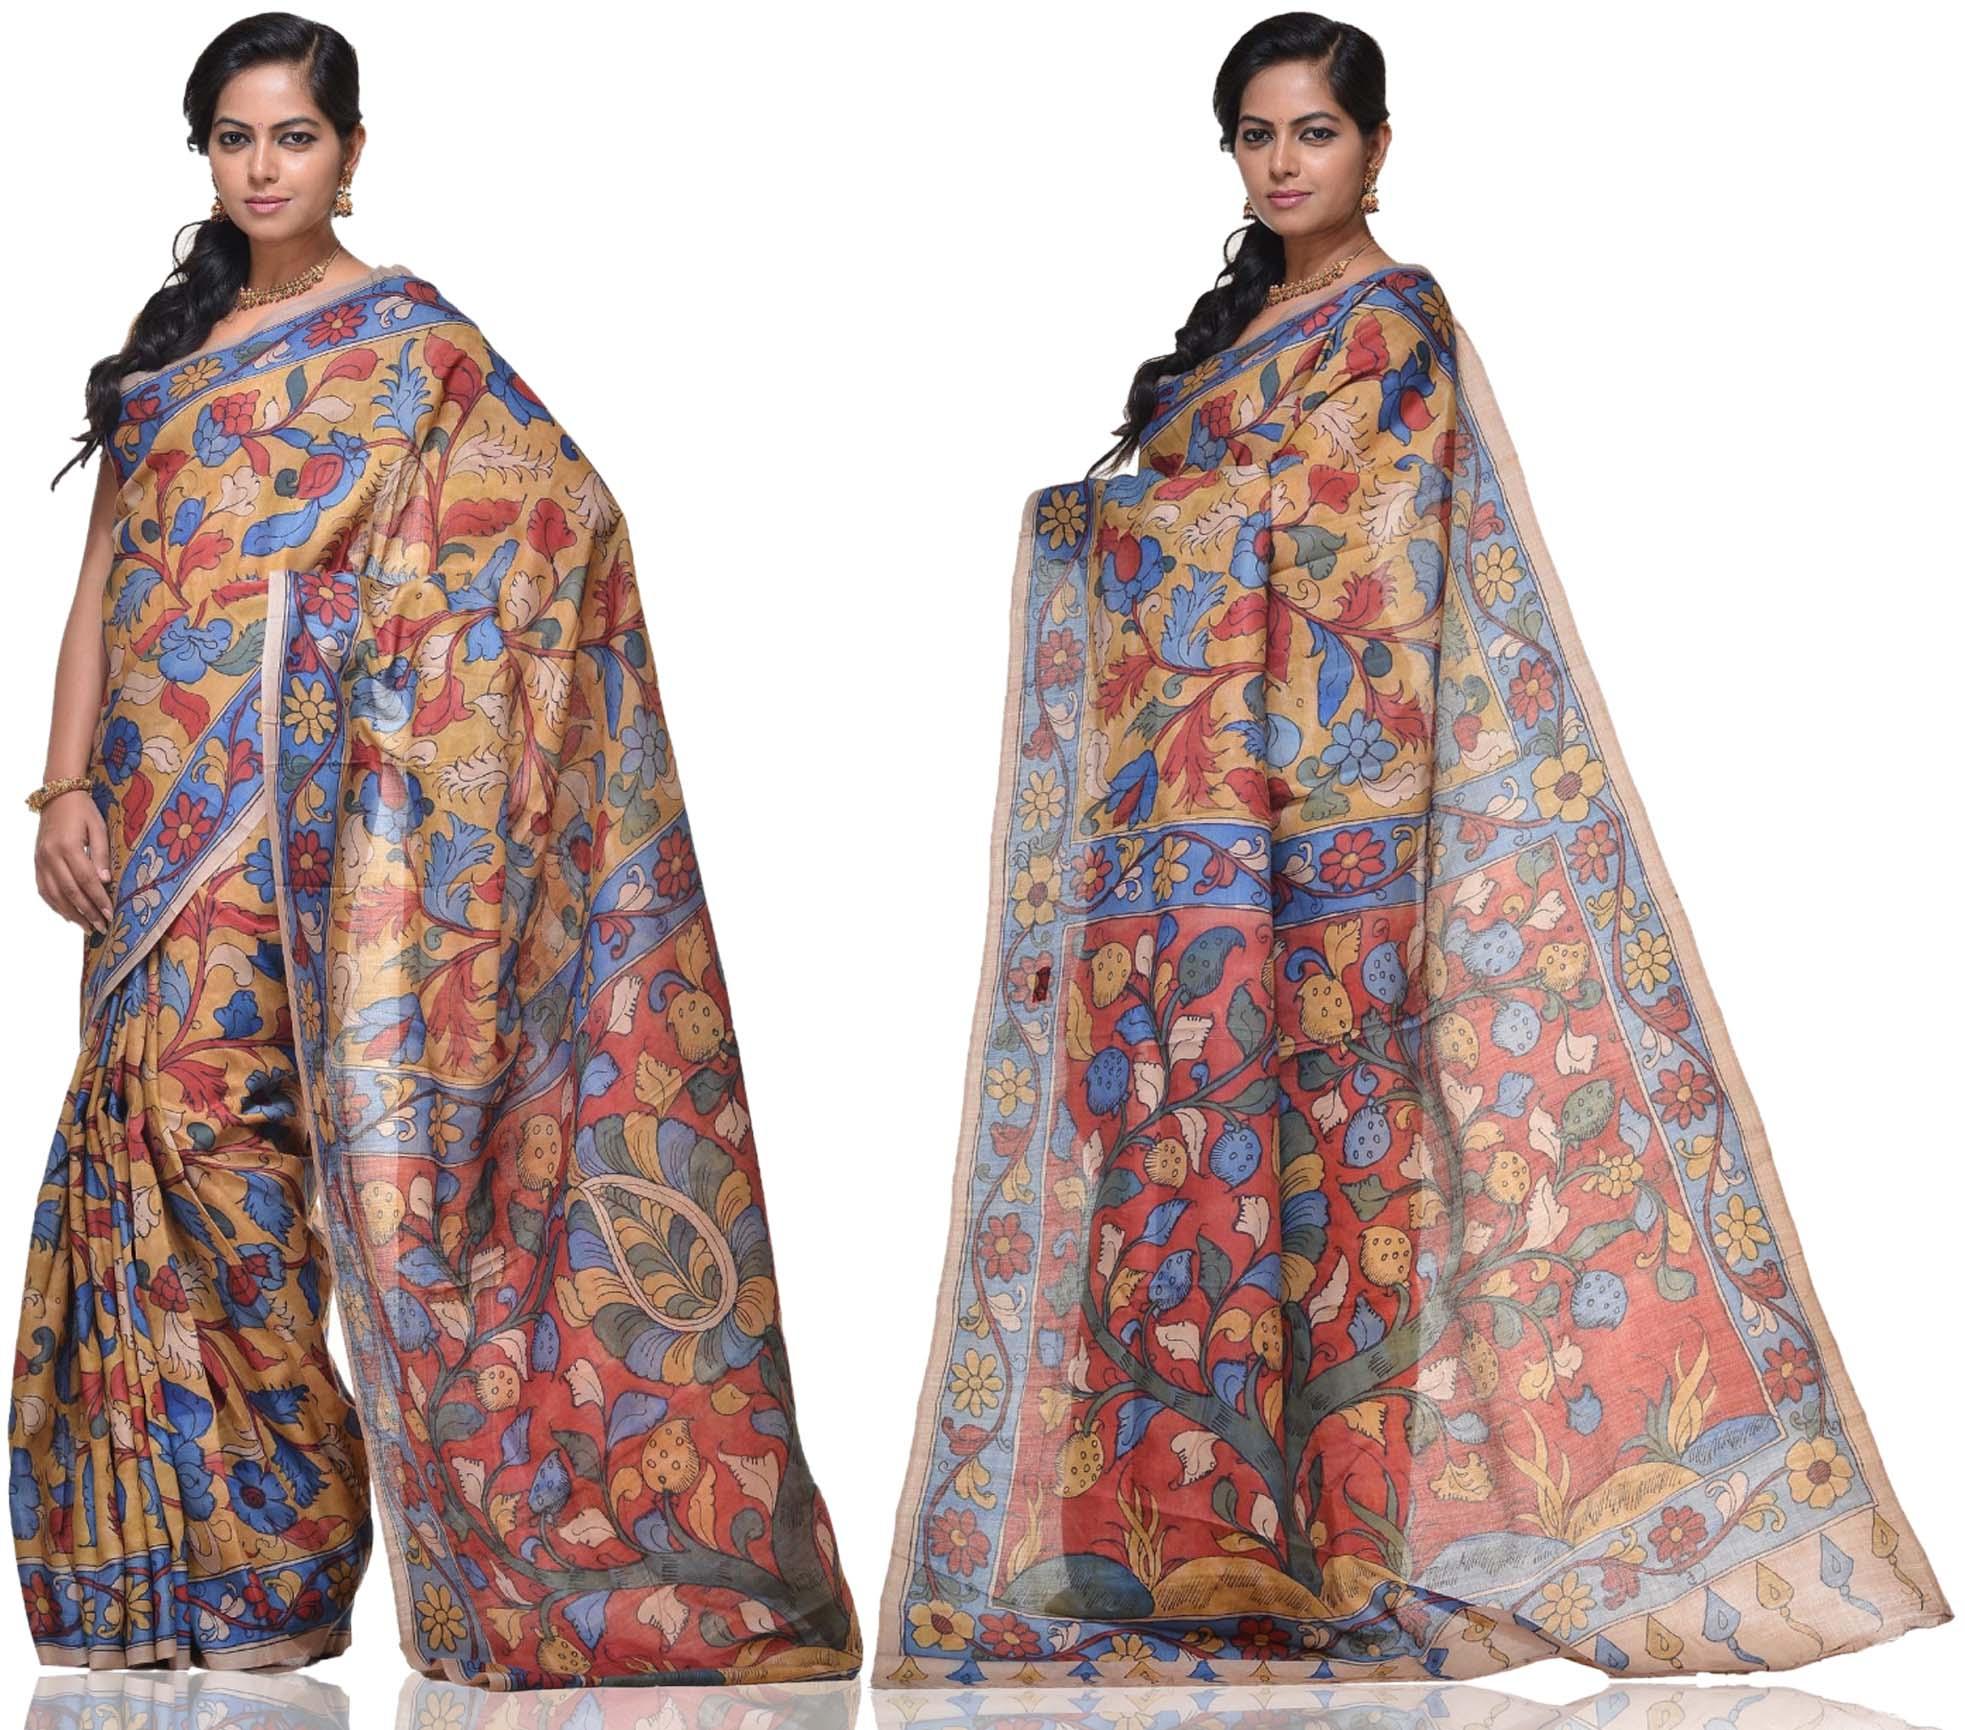 Price: - 15000 /-   New collections of Kalamkari sarees, kalamkari silk sarees, kalamkari cotton sarees, kalamkari cotton dress material, Kalamkari sarees. Sign up now for E-book you will be updated with latest collection of ethnic verities. For More Info Click on :- www.uppada.com  We manufacture of Uppada sarees, Paithani sarees, Banarasi sarees, Venkatagiri Sarees, Gadwal Sarees, Khadi sarees, Hand Painted Kalamkari Dupatta, Ikkat sarees, Kanchipuram Sarees, Dupattas, Stoles etc. For more info us at 040 64640303, 441905005.  Buy online: - uppada.com  - by Paithani, Hyderabad